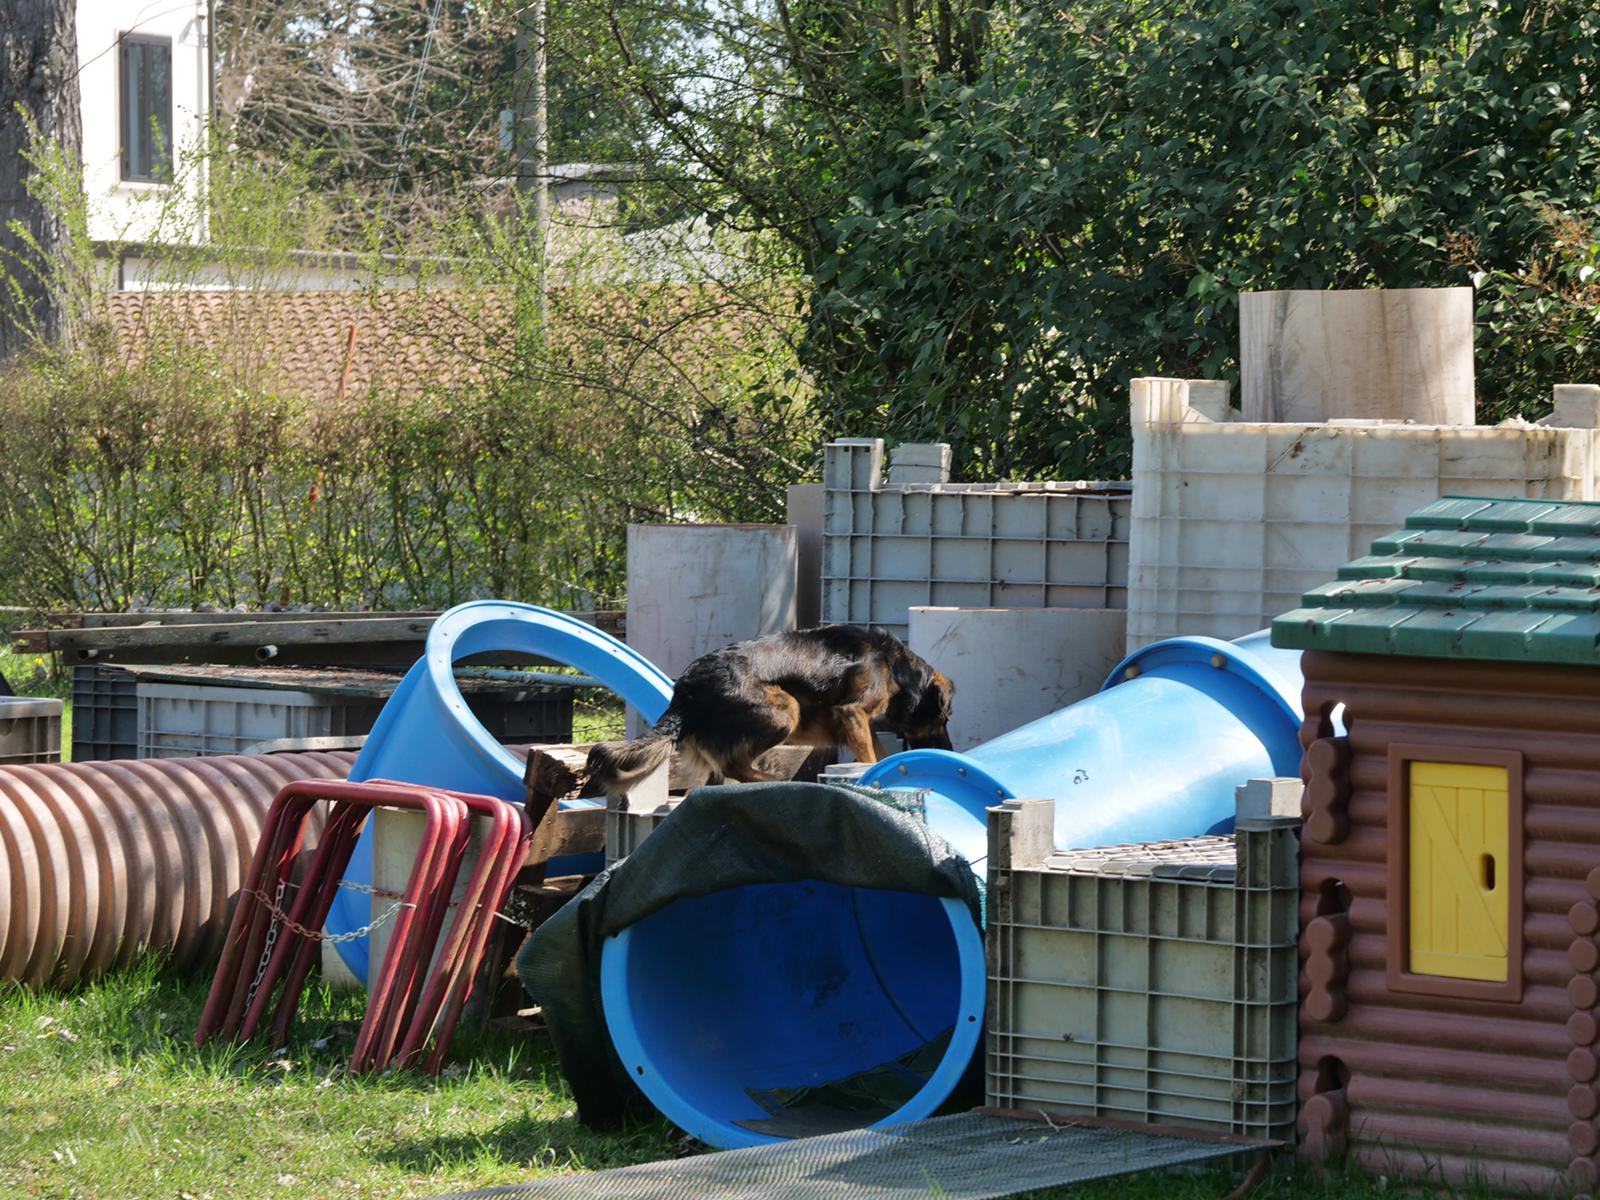 cane in attività di addestramento